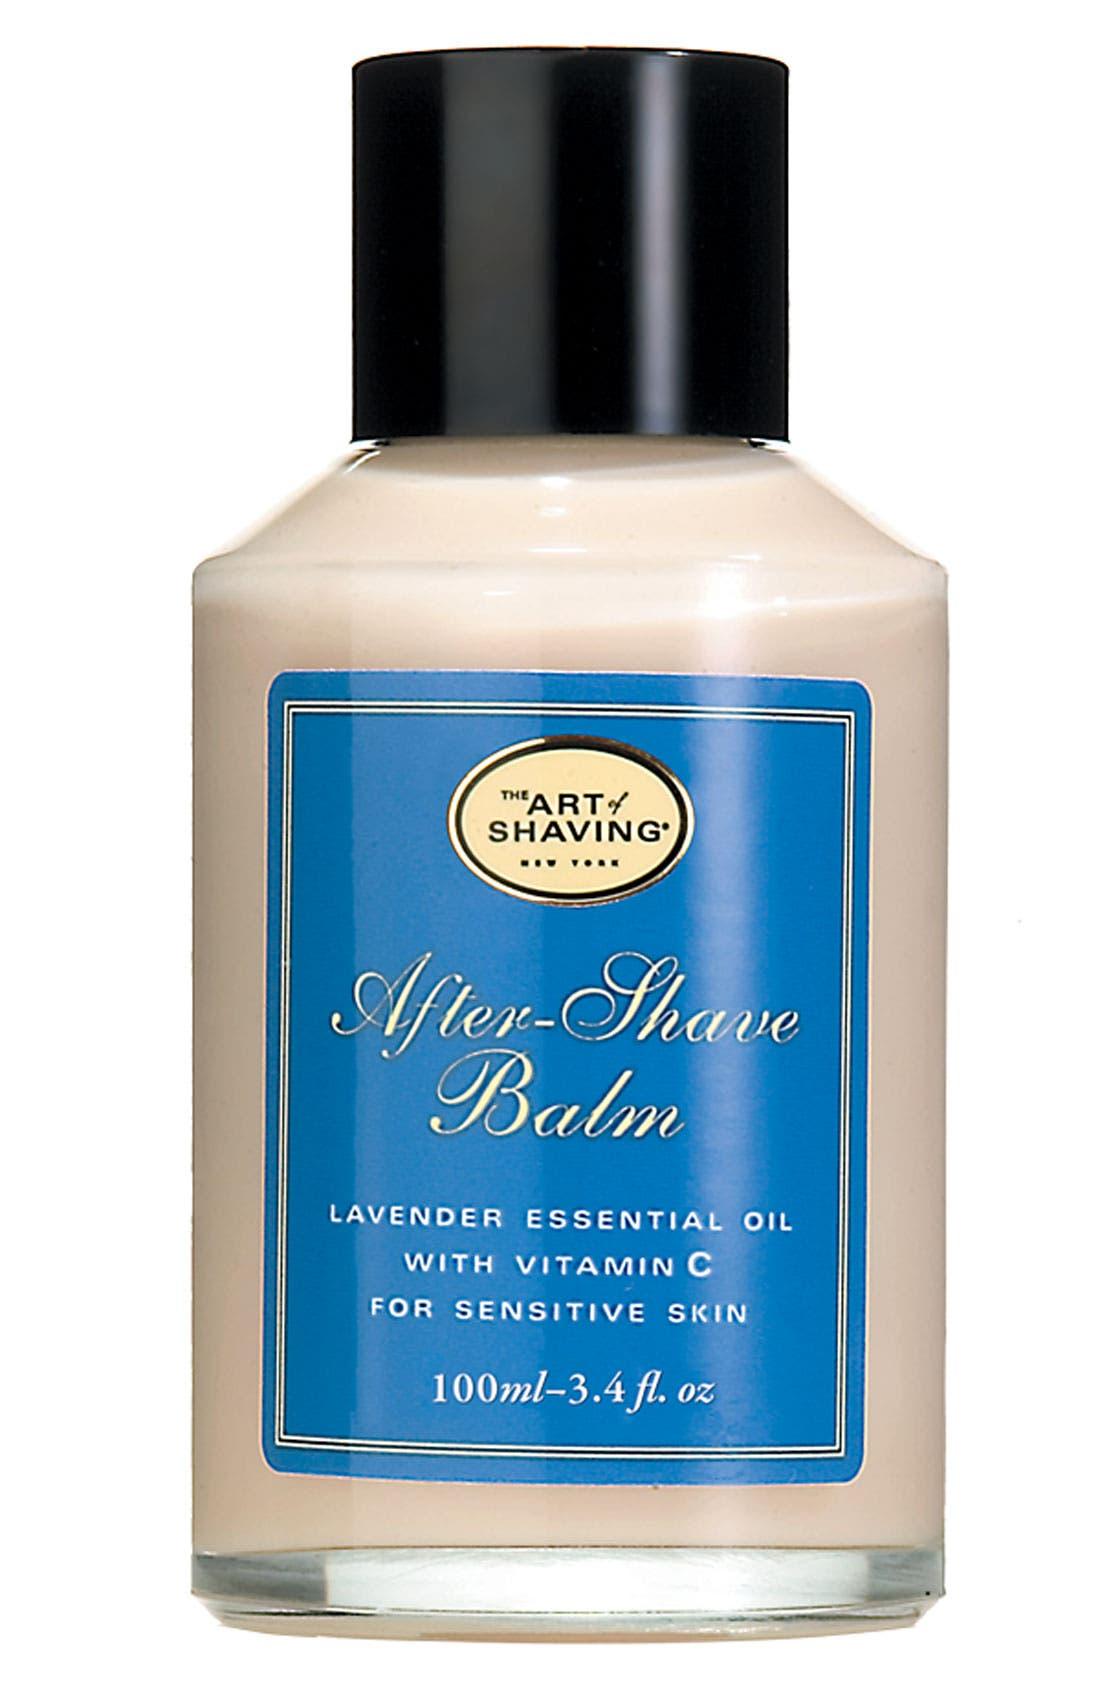 The Art of Shaving® Lavender After-Shave Balm